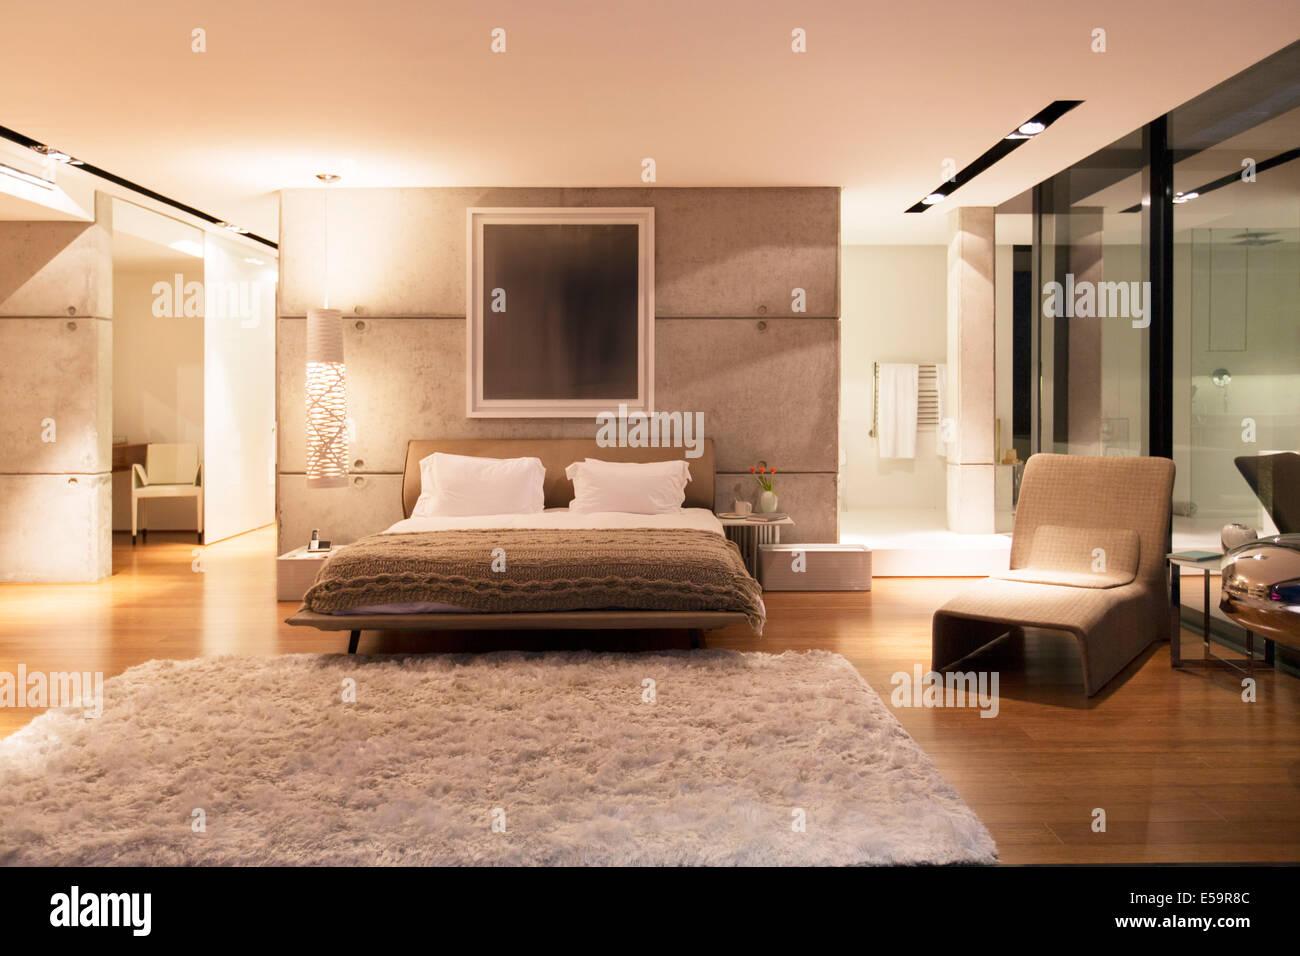 Shag tapis chambre à coucher moderne Photo Stock